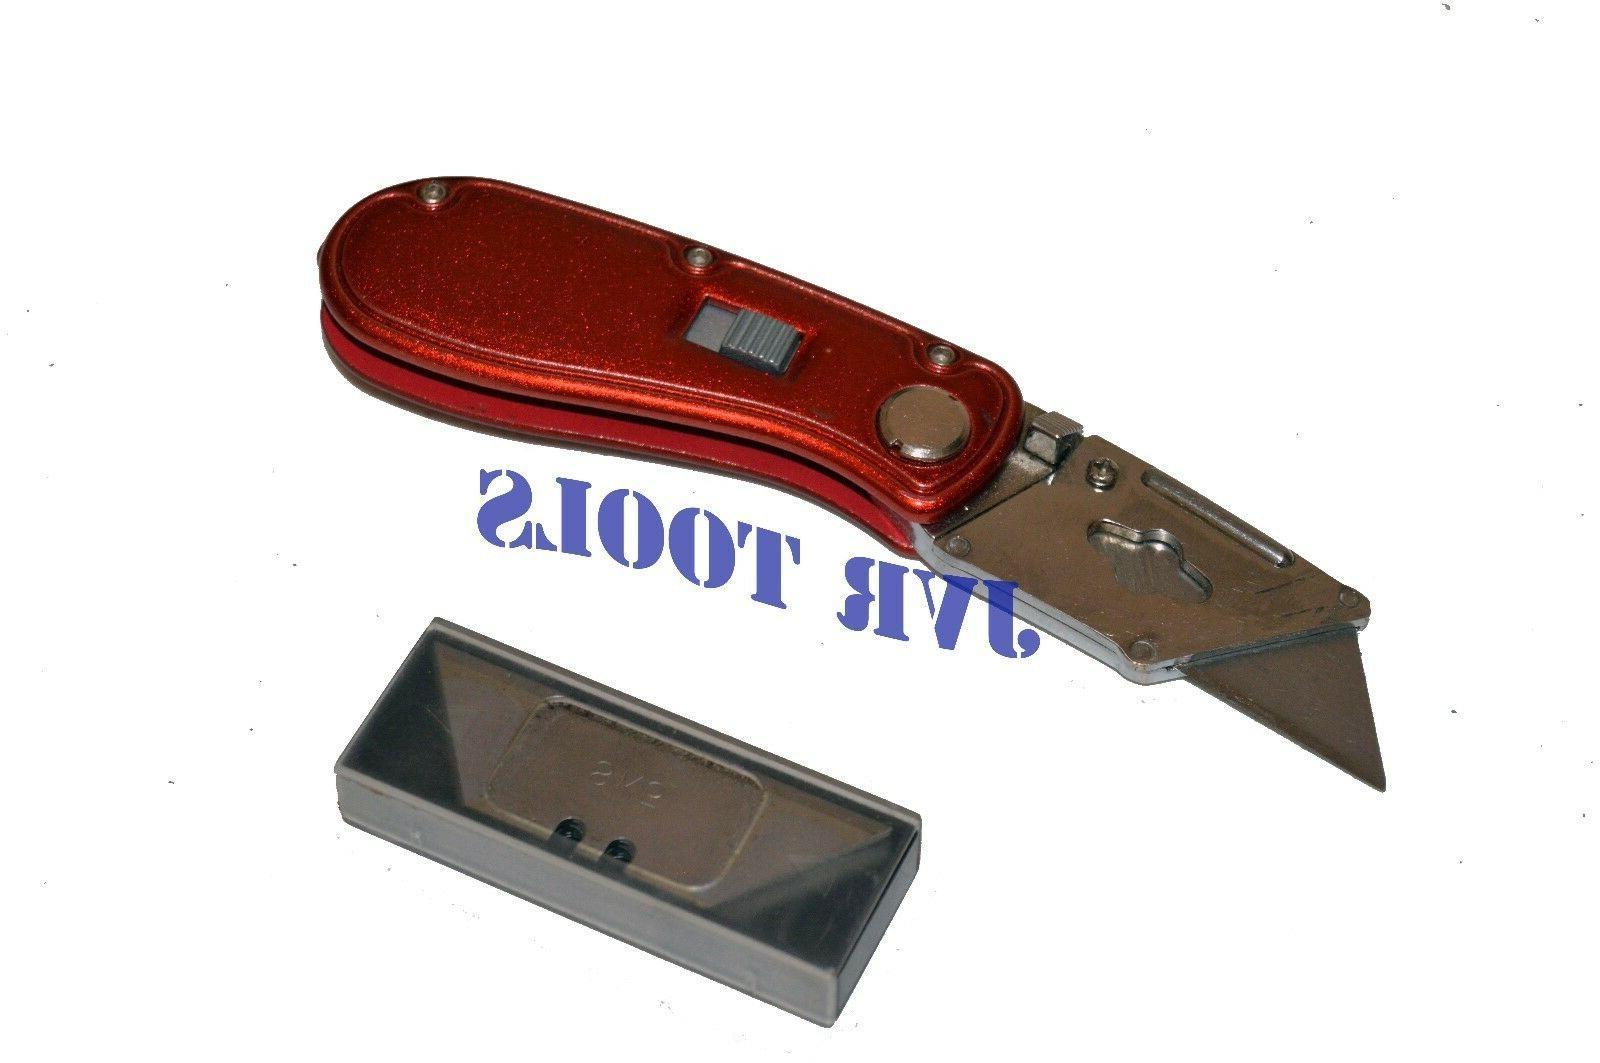 Folding Lock Back Utility Knife Box Cutter Clip 10 Blades Qu